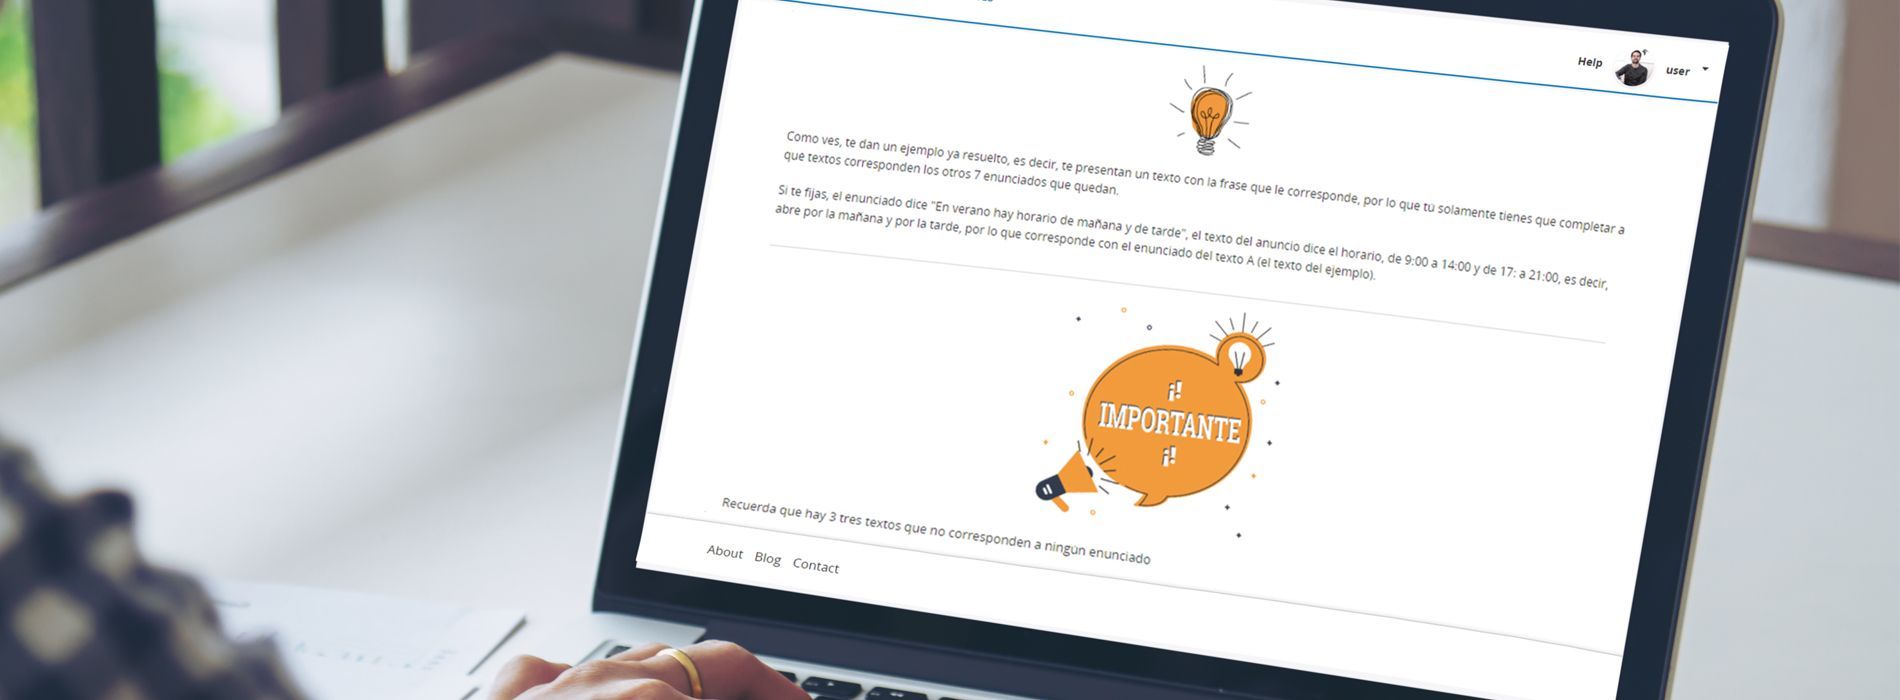 Learn And Study Spanish Online Best Platform Teachers